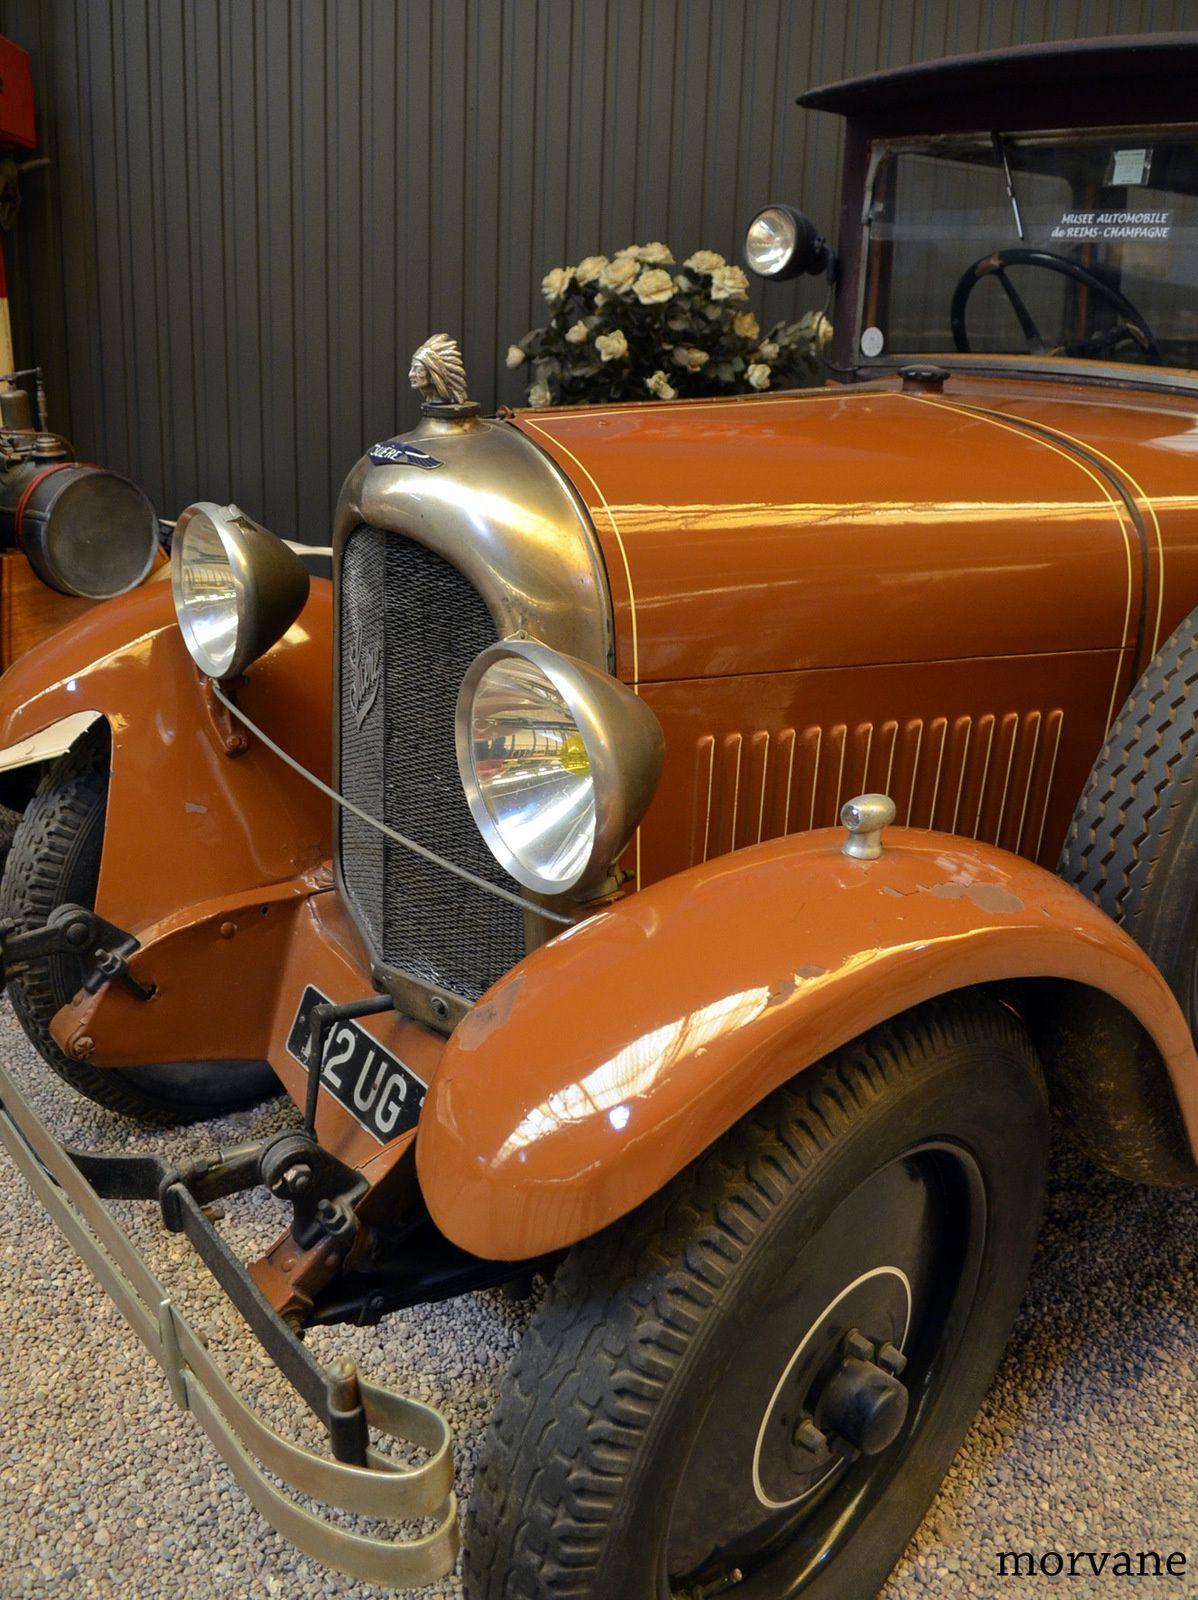 SUERE Type D. Berline Landolet. 80 km/h. 1925.